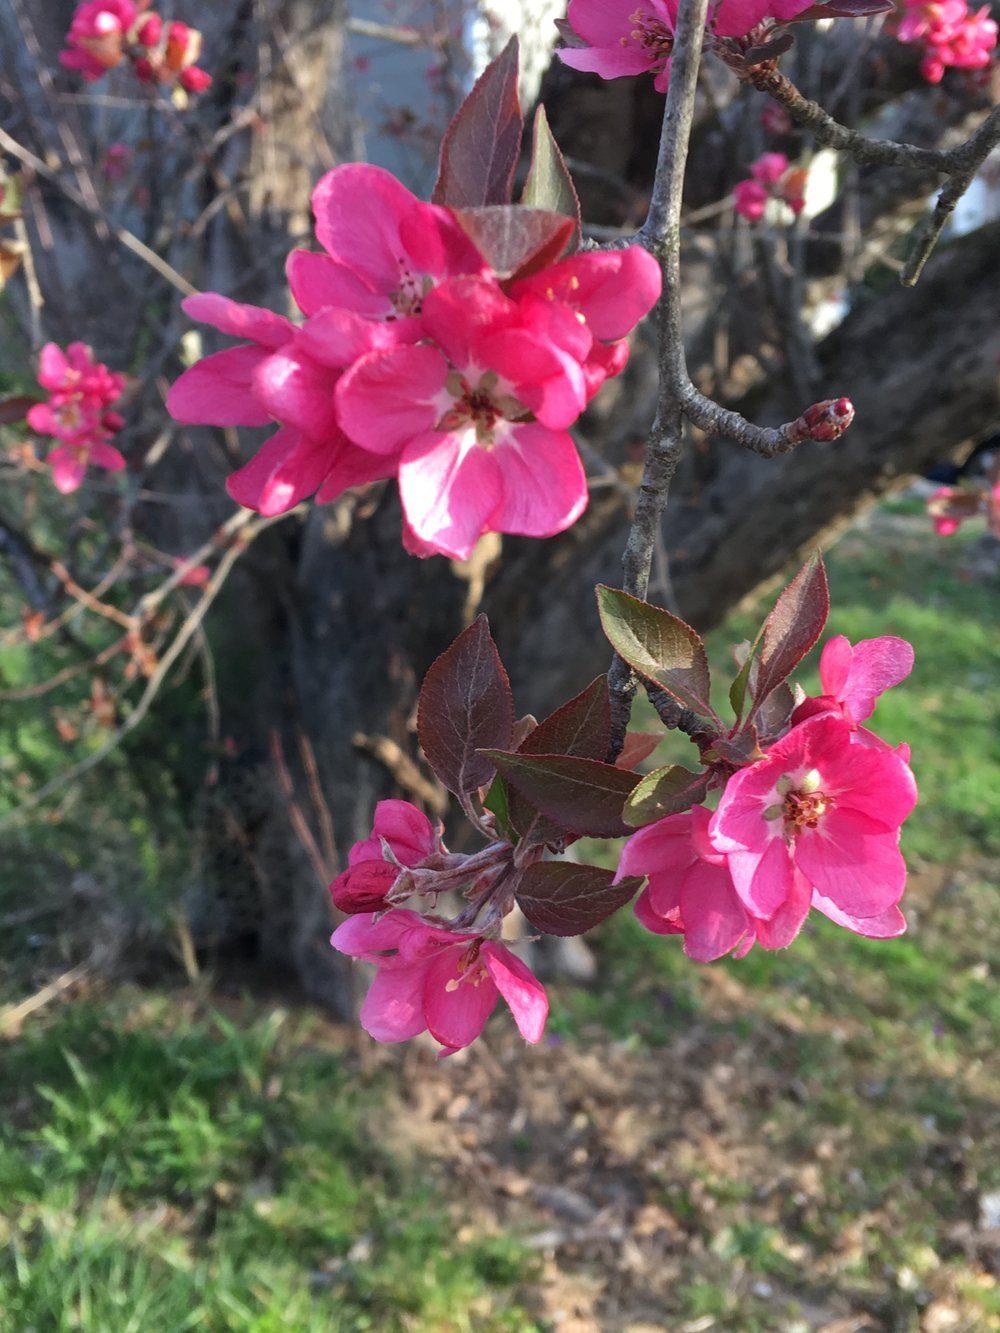 appleblossom-3163819